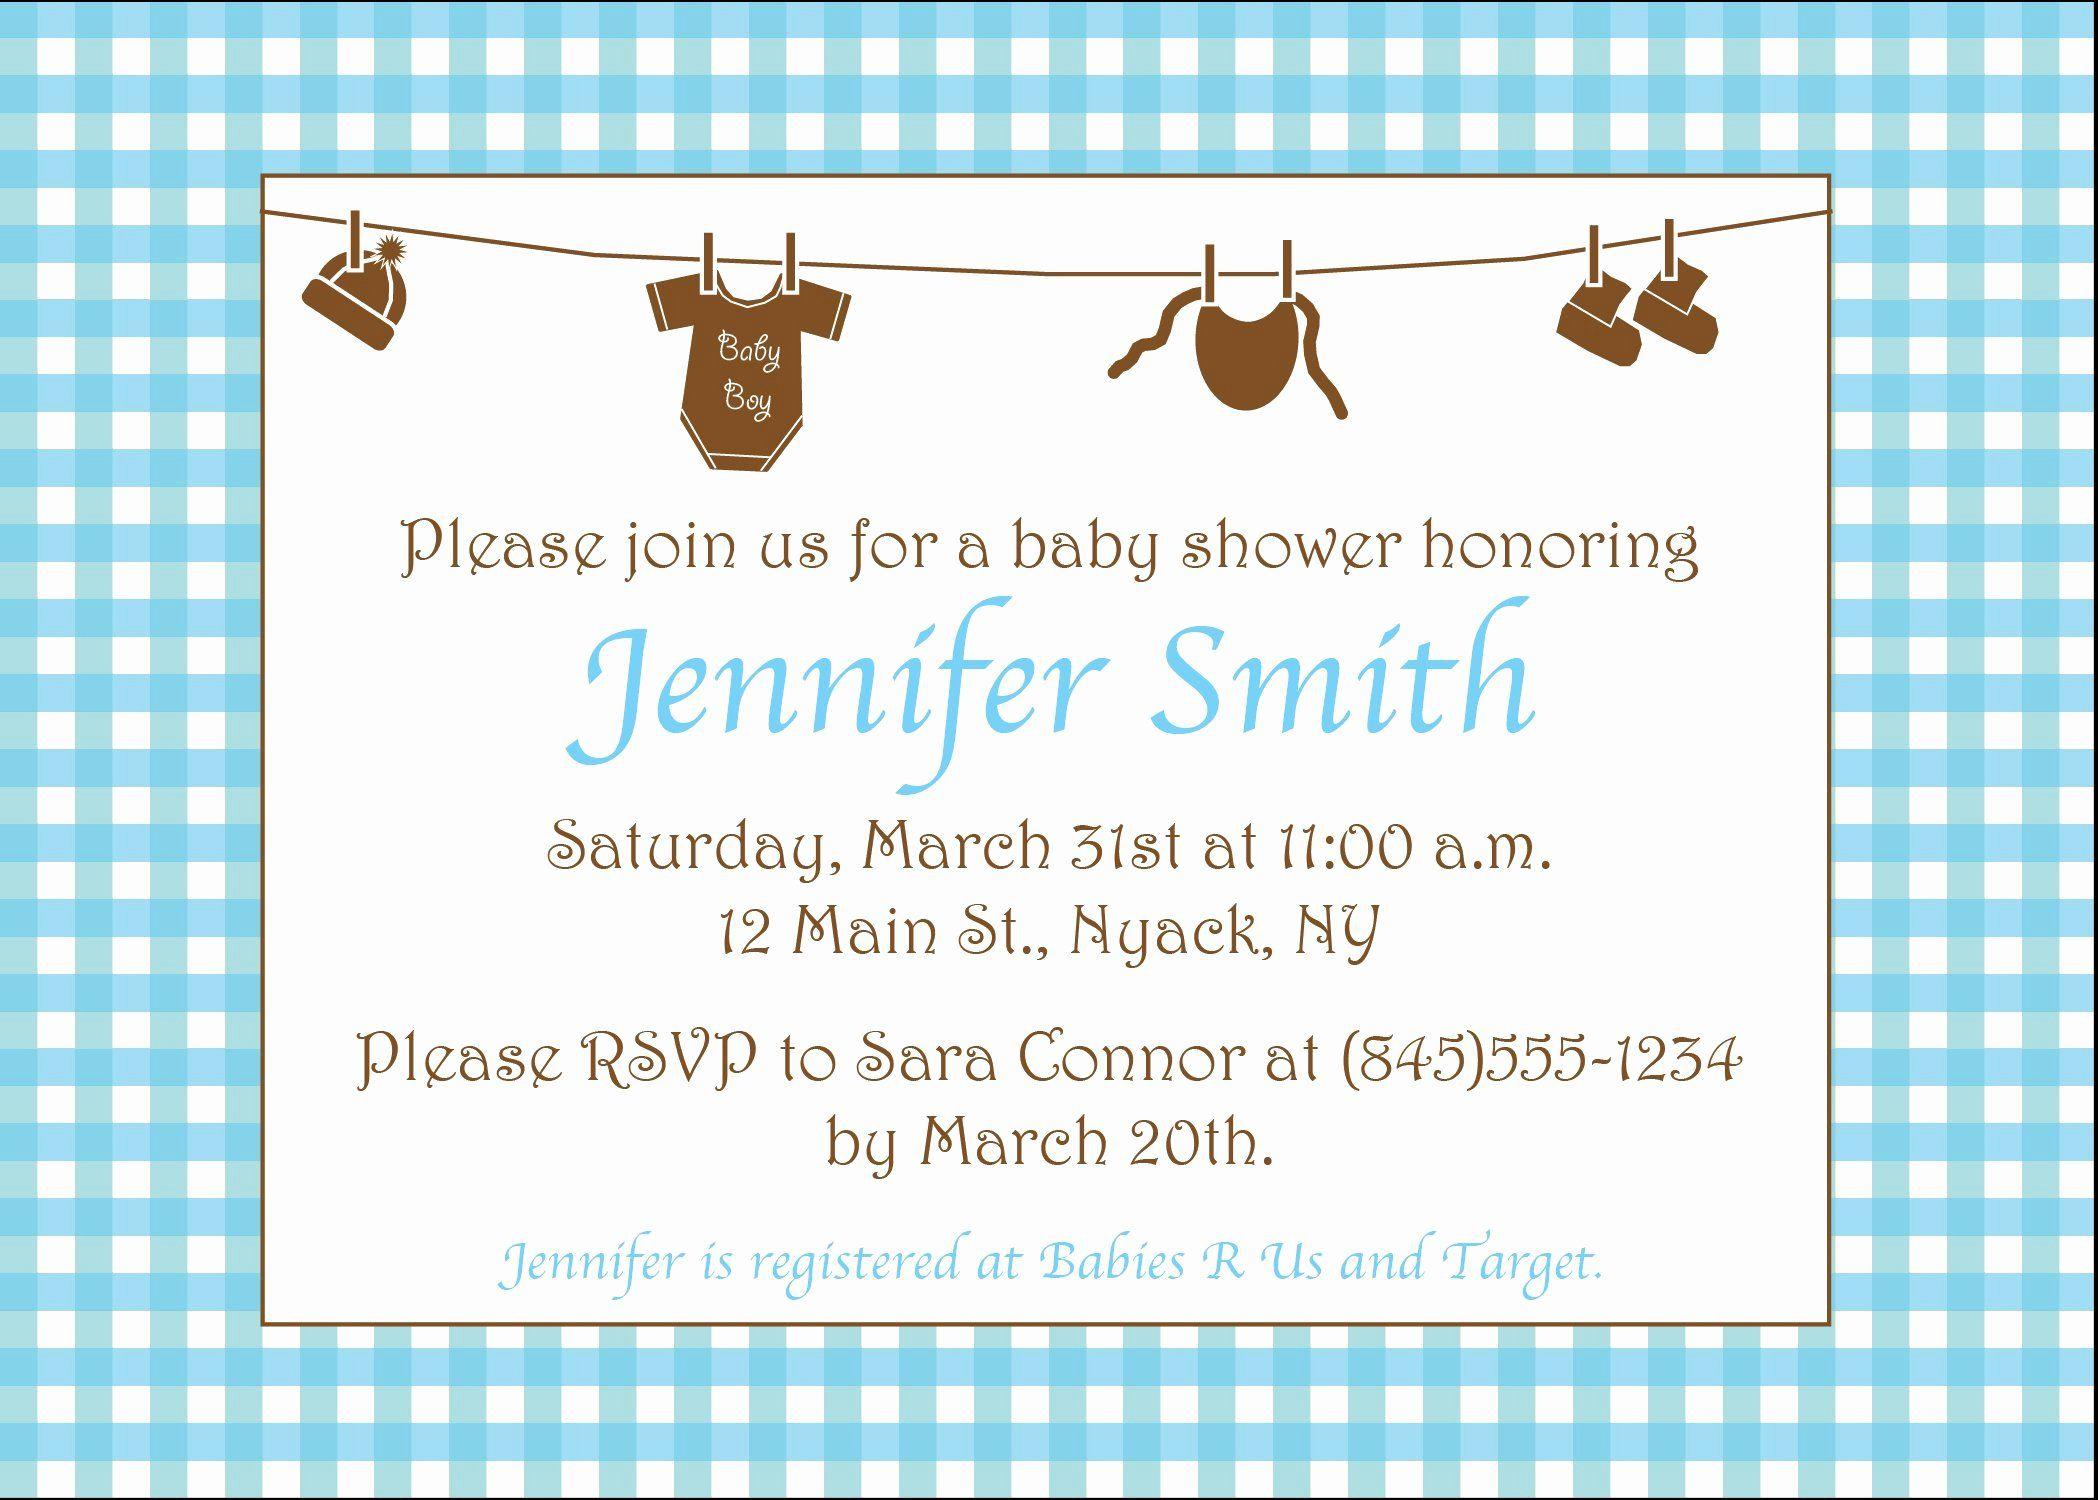 Sample Baby Shower Invitations Fresh Birthday Invitation Mickey Mo Baby Shower Invitation Cards Baby Shower Invitation Wording Baby Shower Invitations For Boys